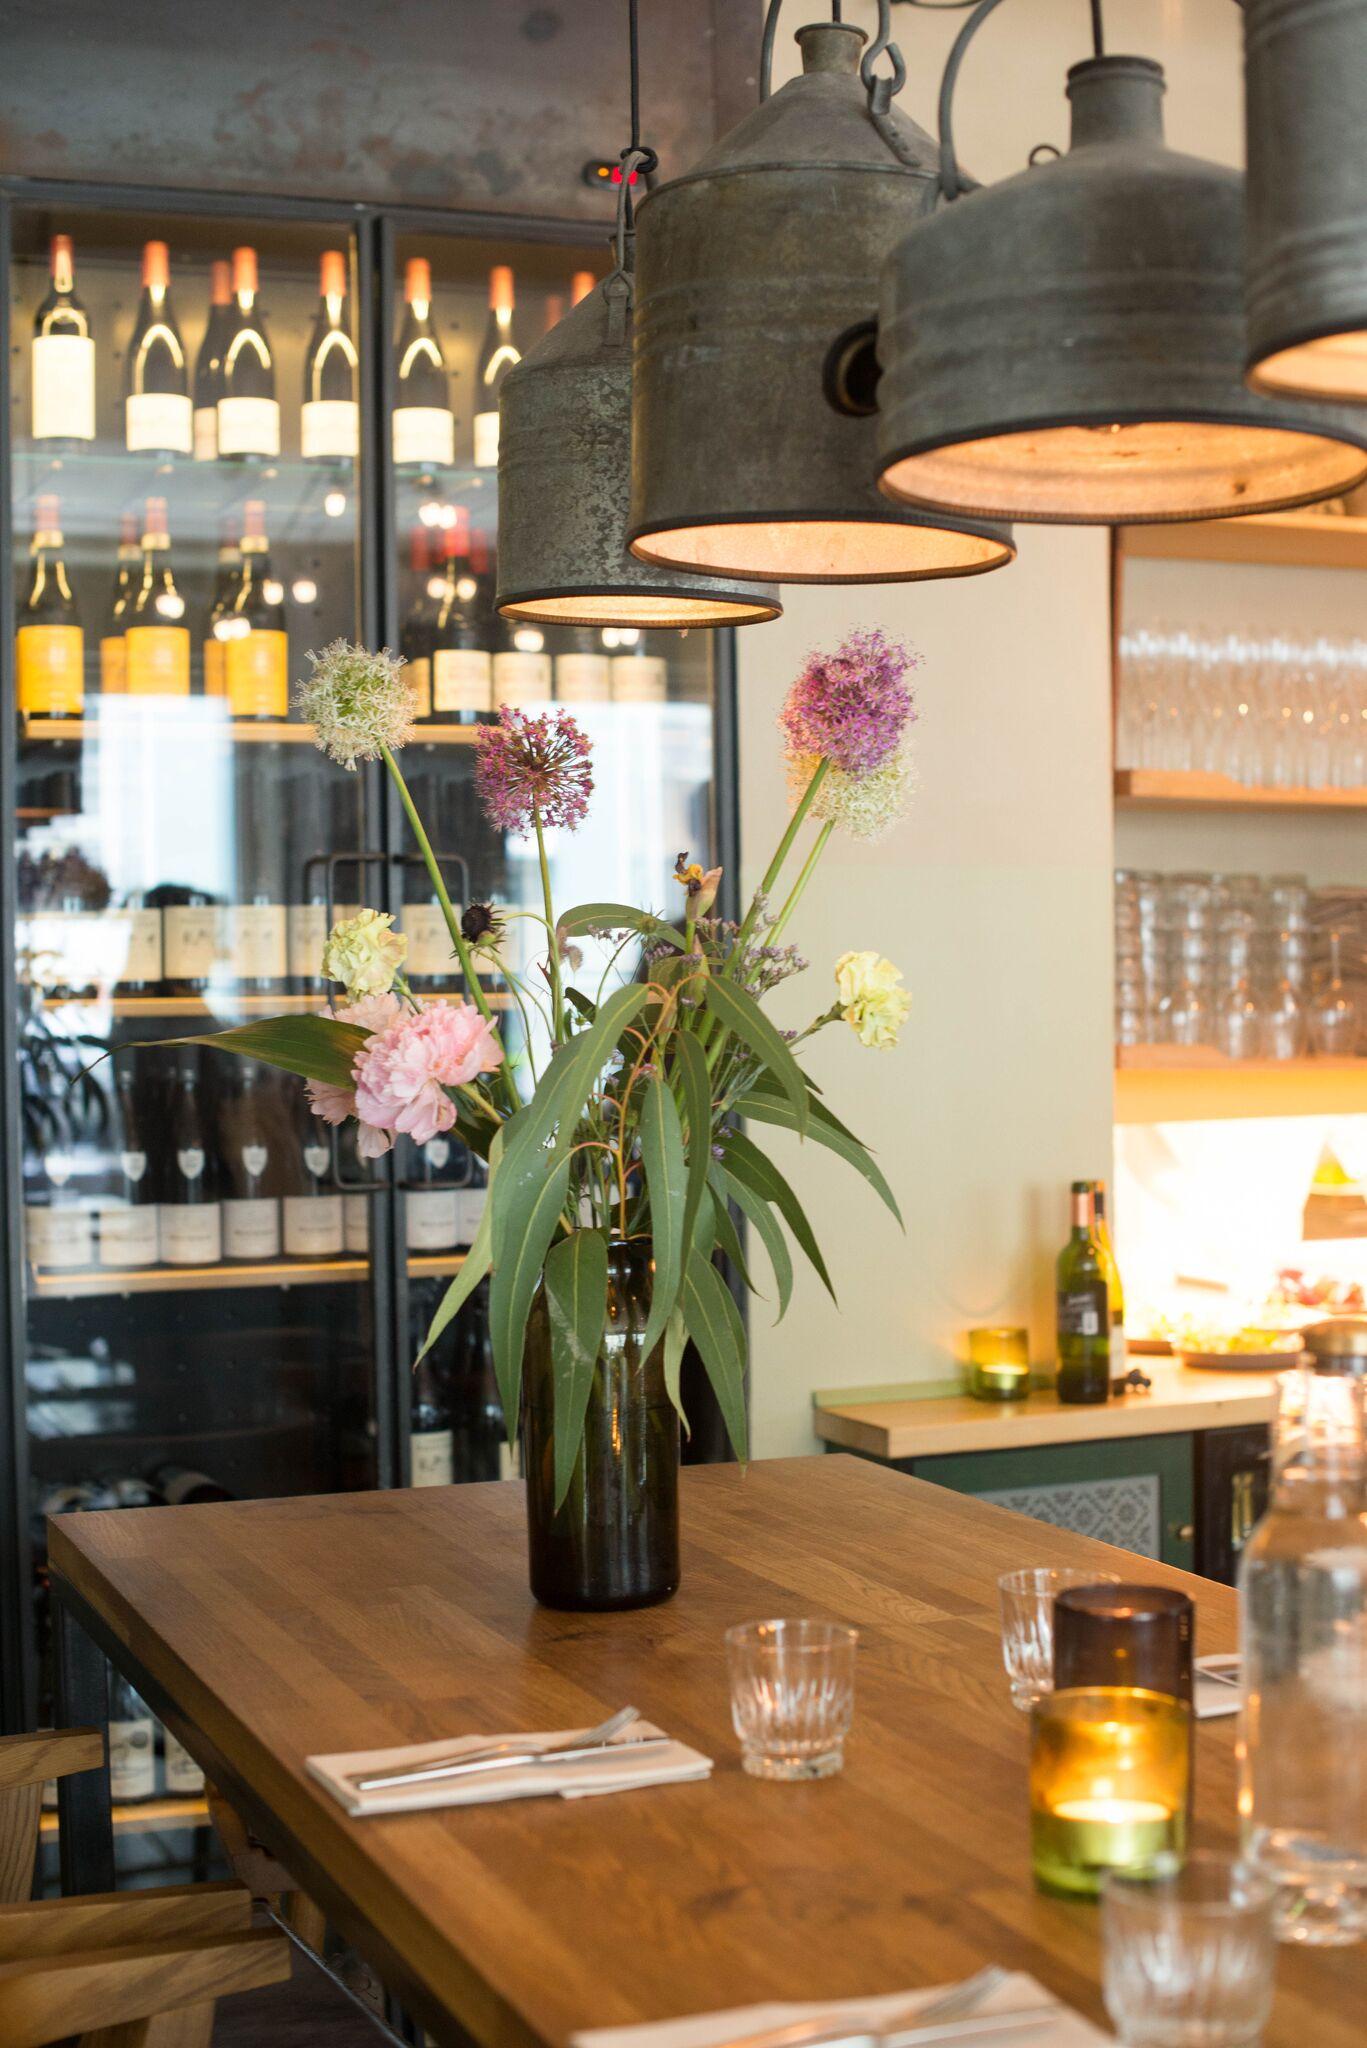 vakst copenhagen restaurant